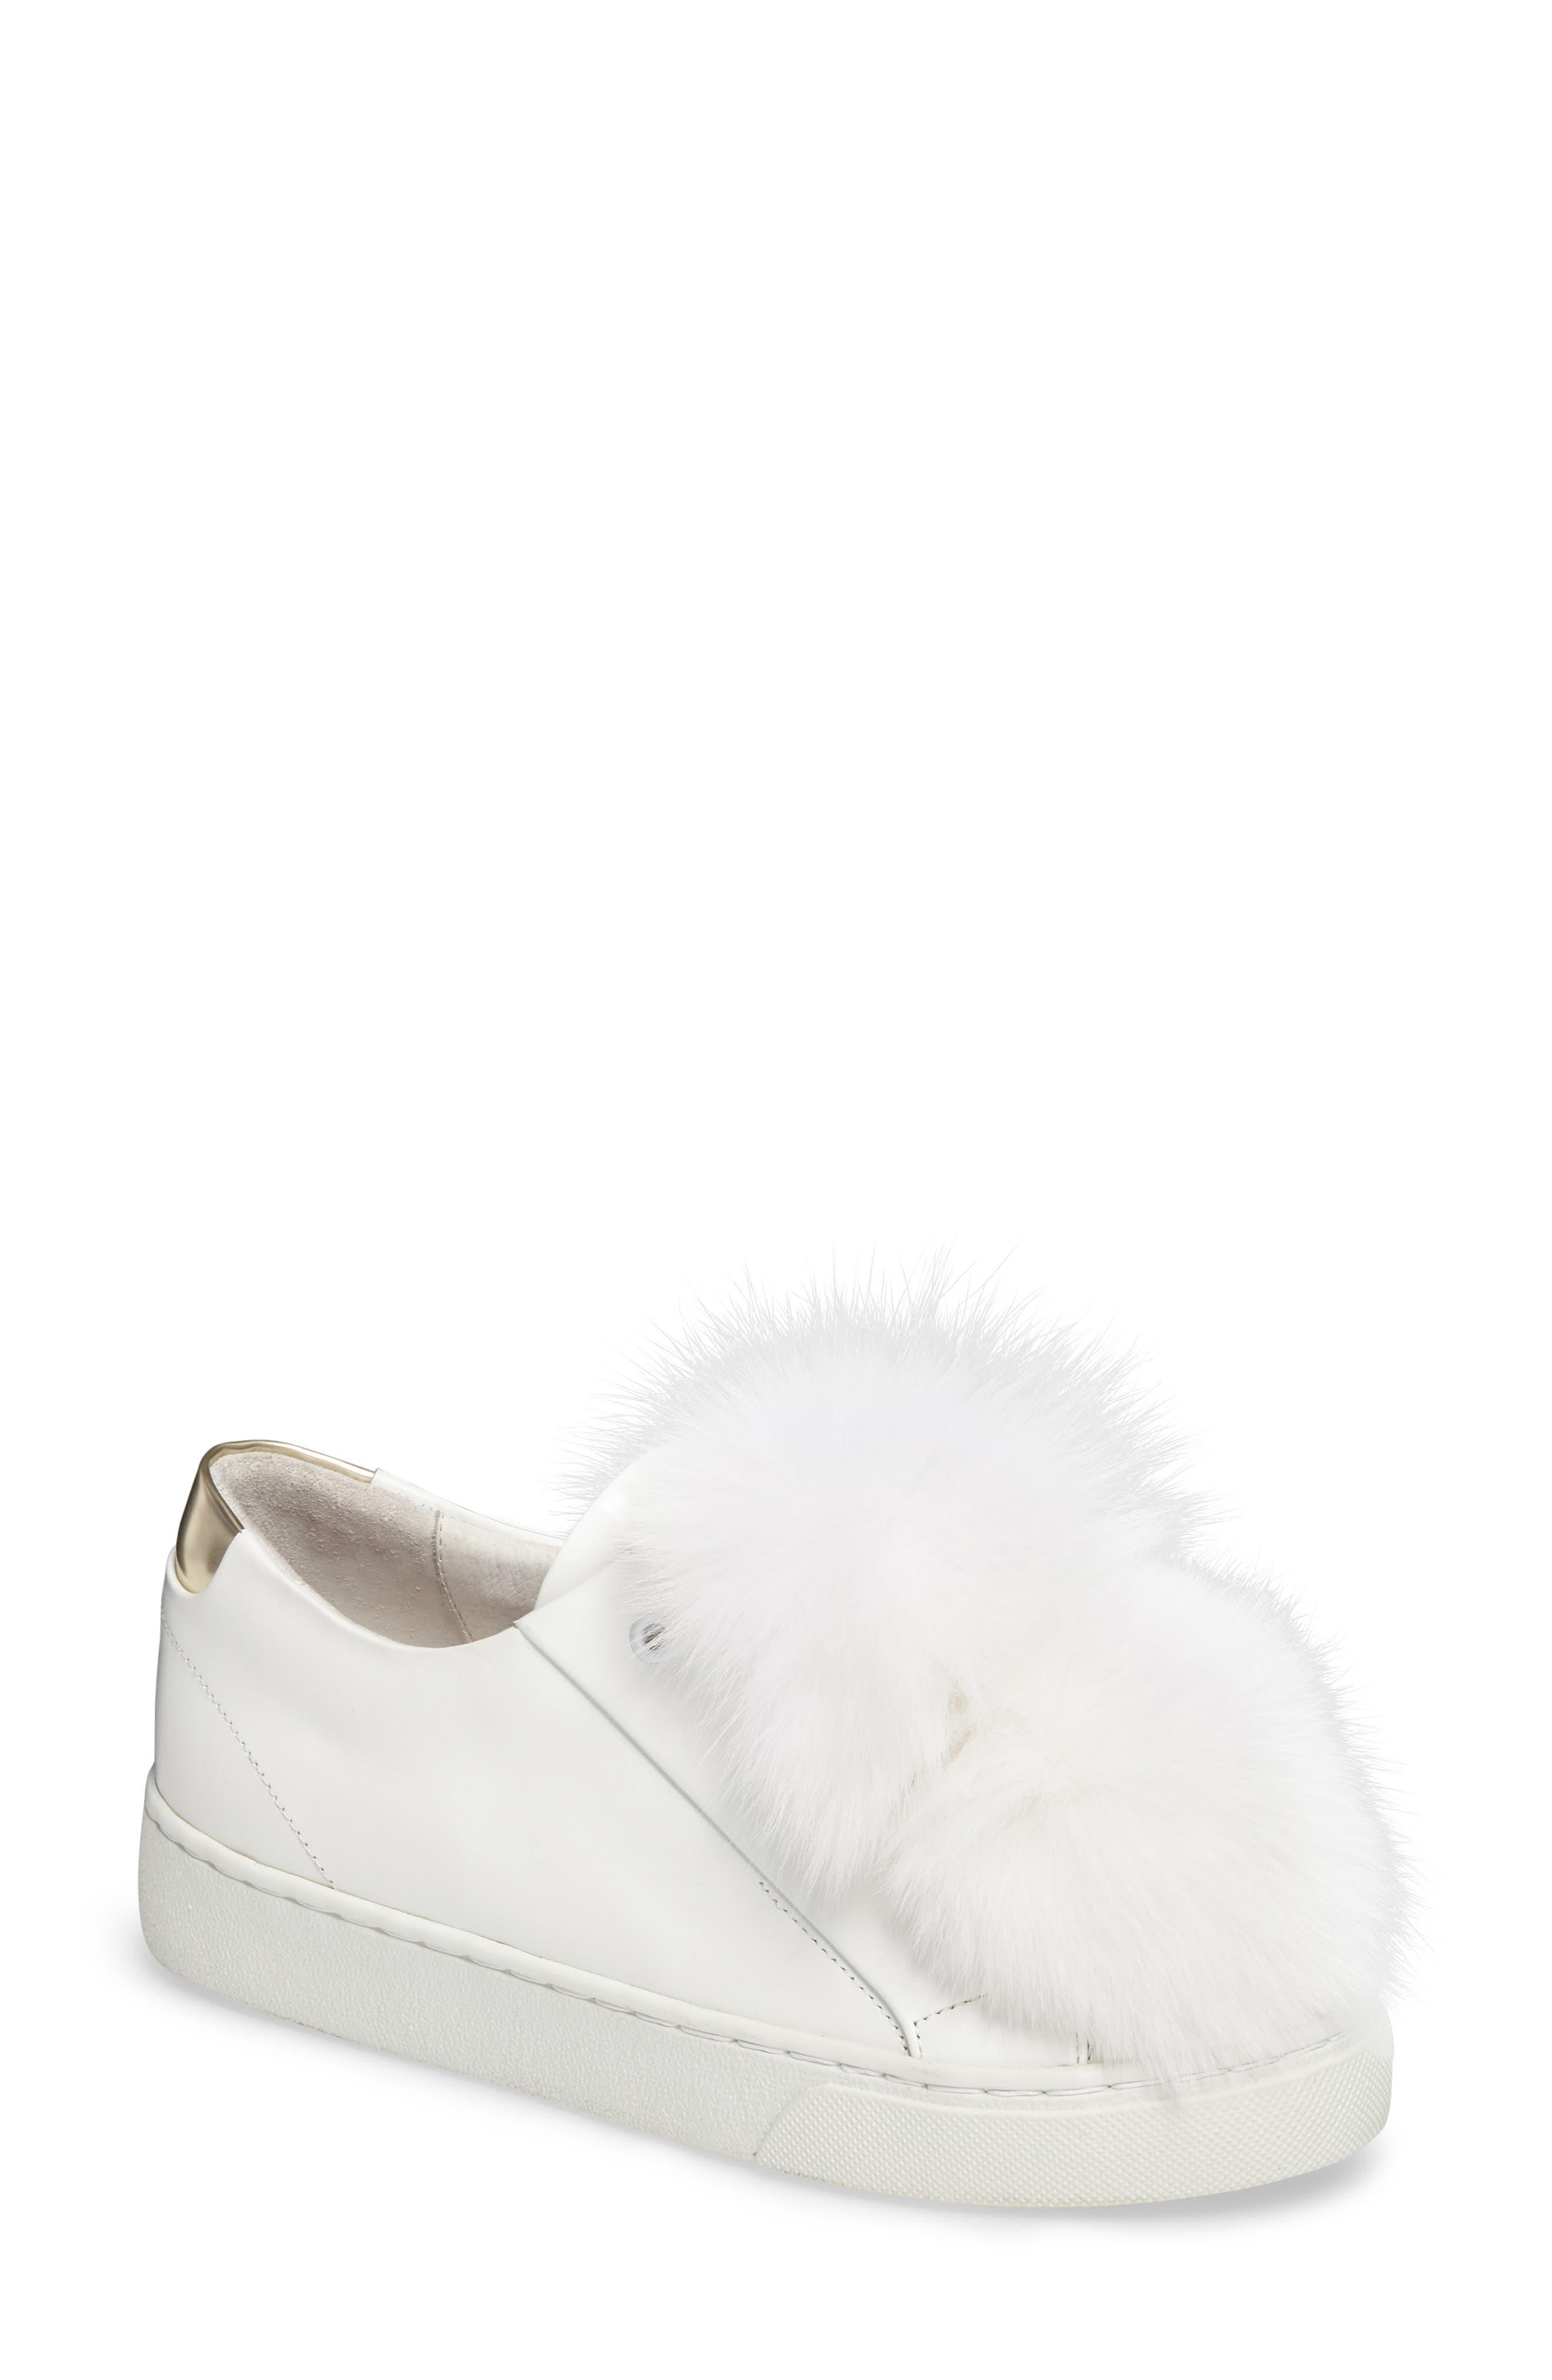 Sugar Genuine Fox Fur Slip-On Sneaker,                         Main,                         color, White Leather